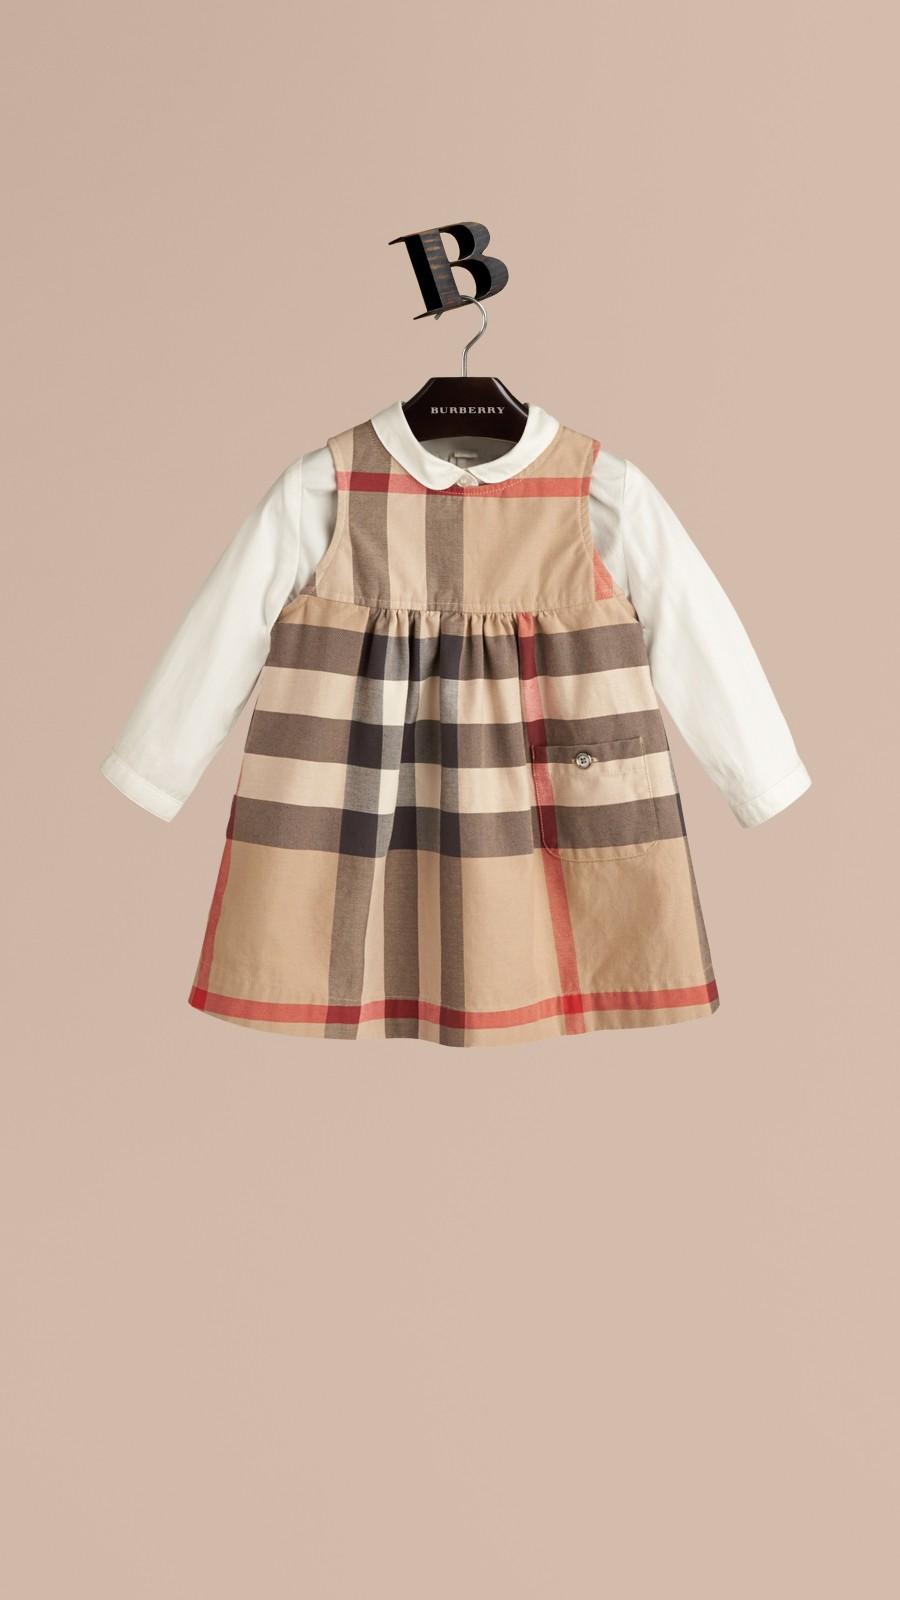 New classic Check Cotton Dress - Image 1